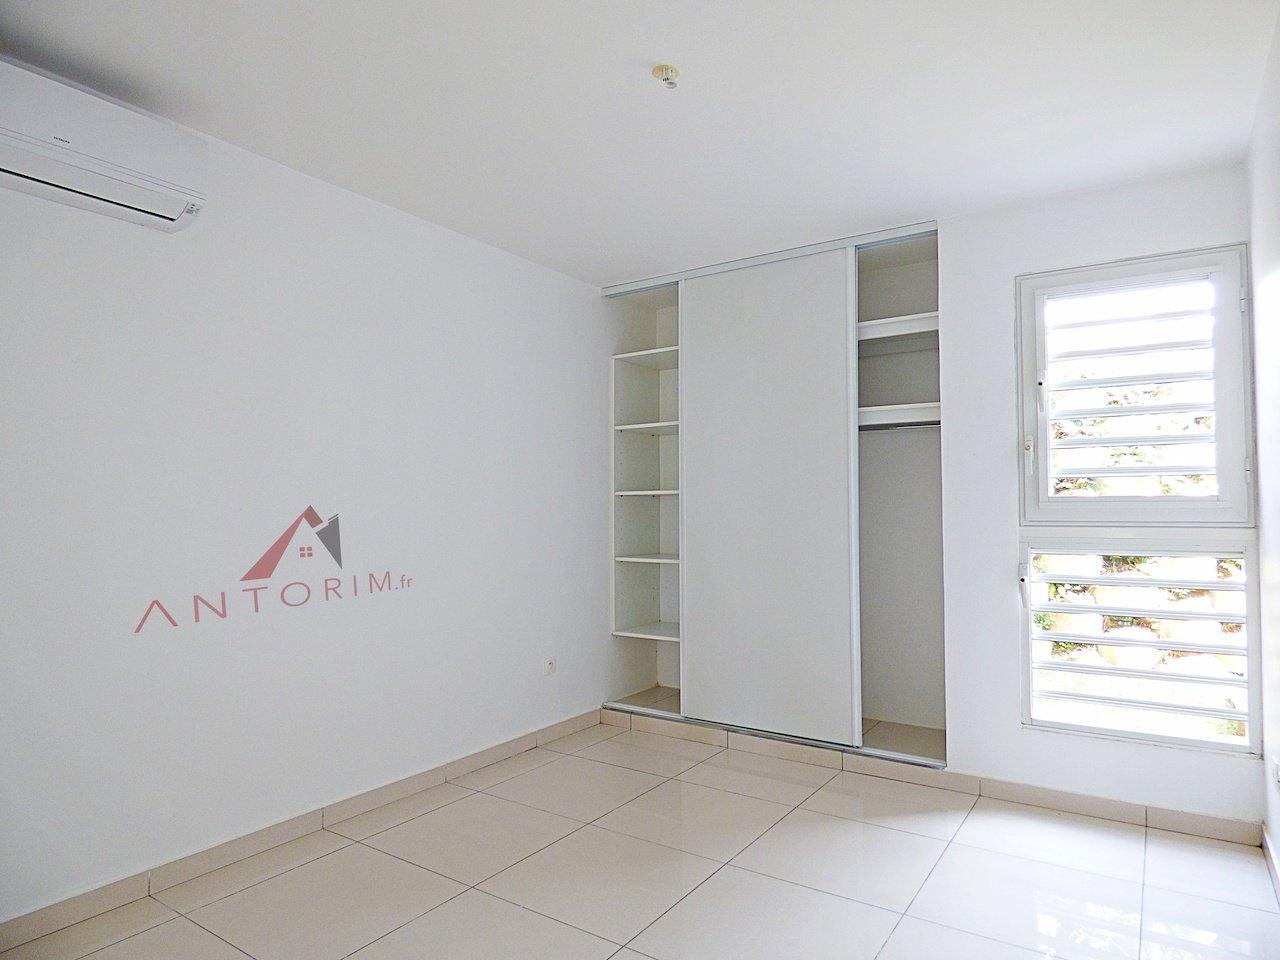 RAVINE VILAINE - Grand T3 NEUF - Chambres Climatisées - Terrasse